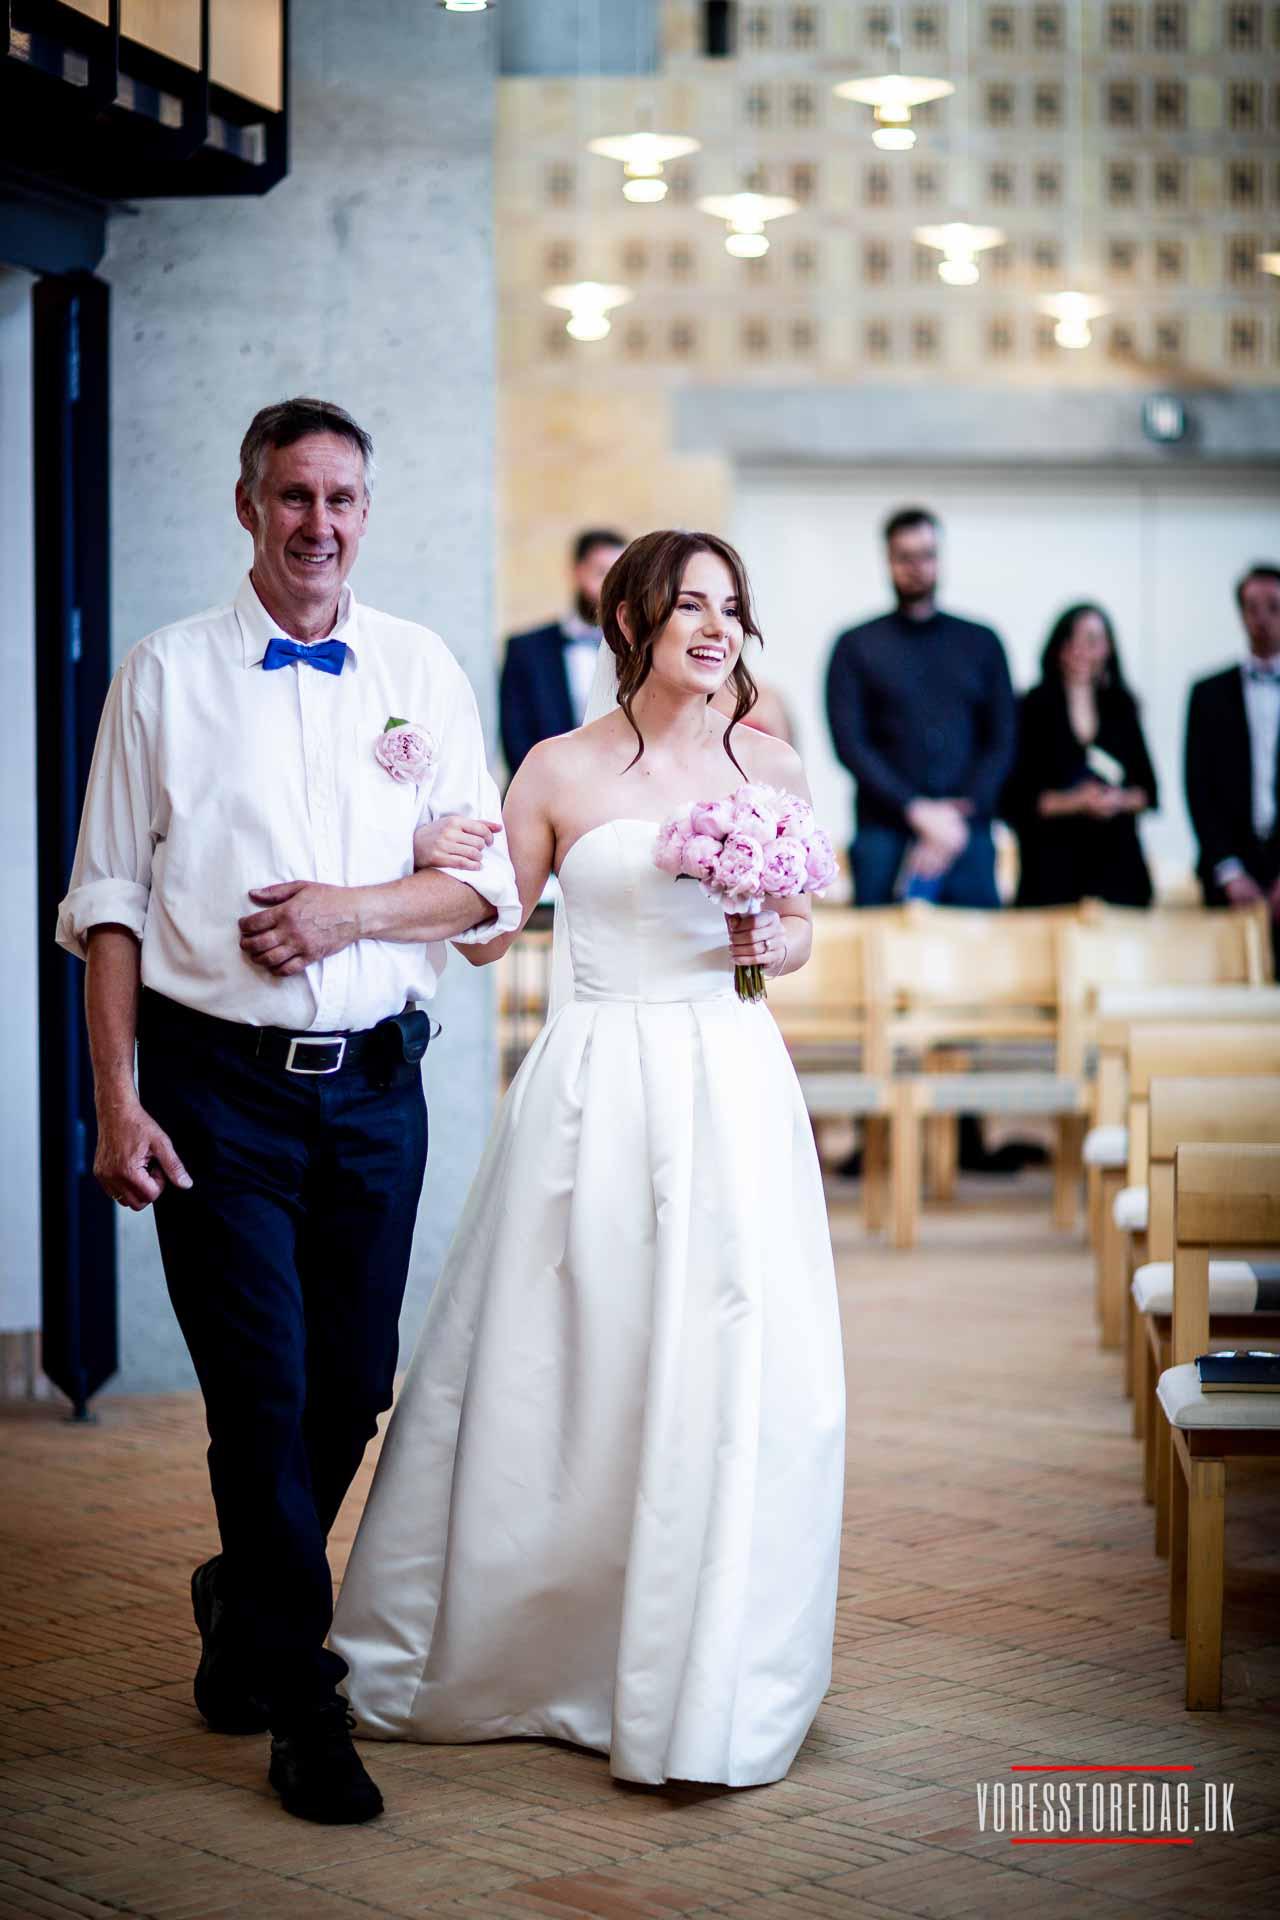 Er et kirkebryllup dyrere end et bryllup på rådhuset?